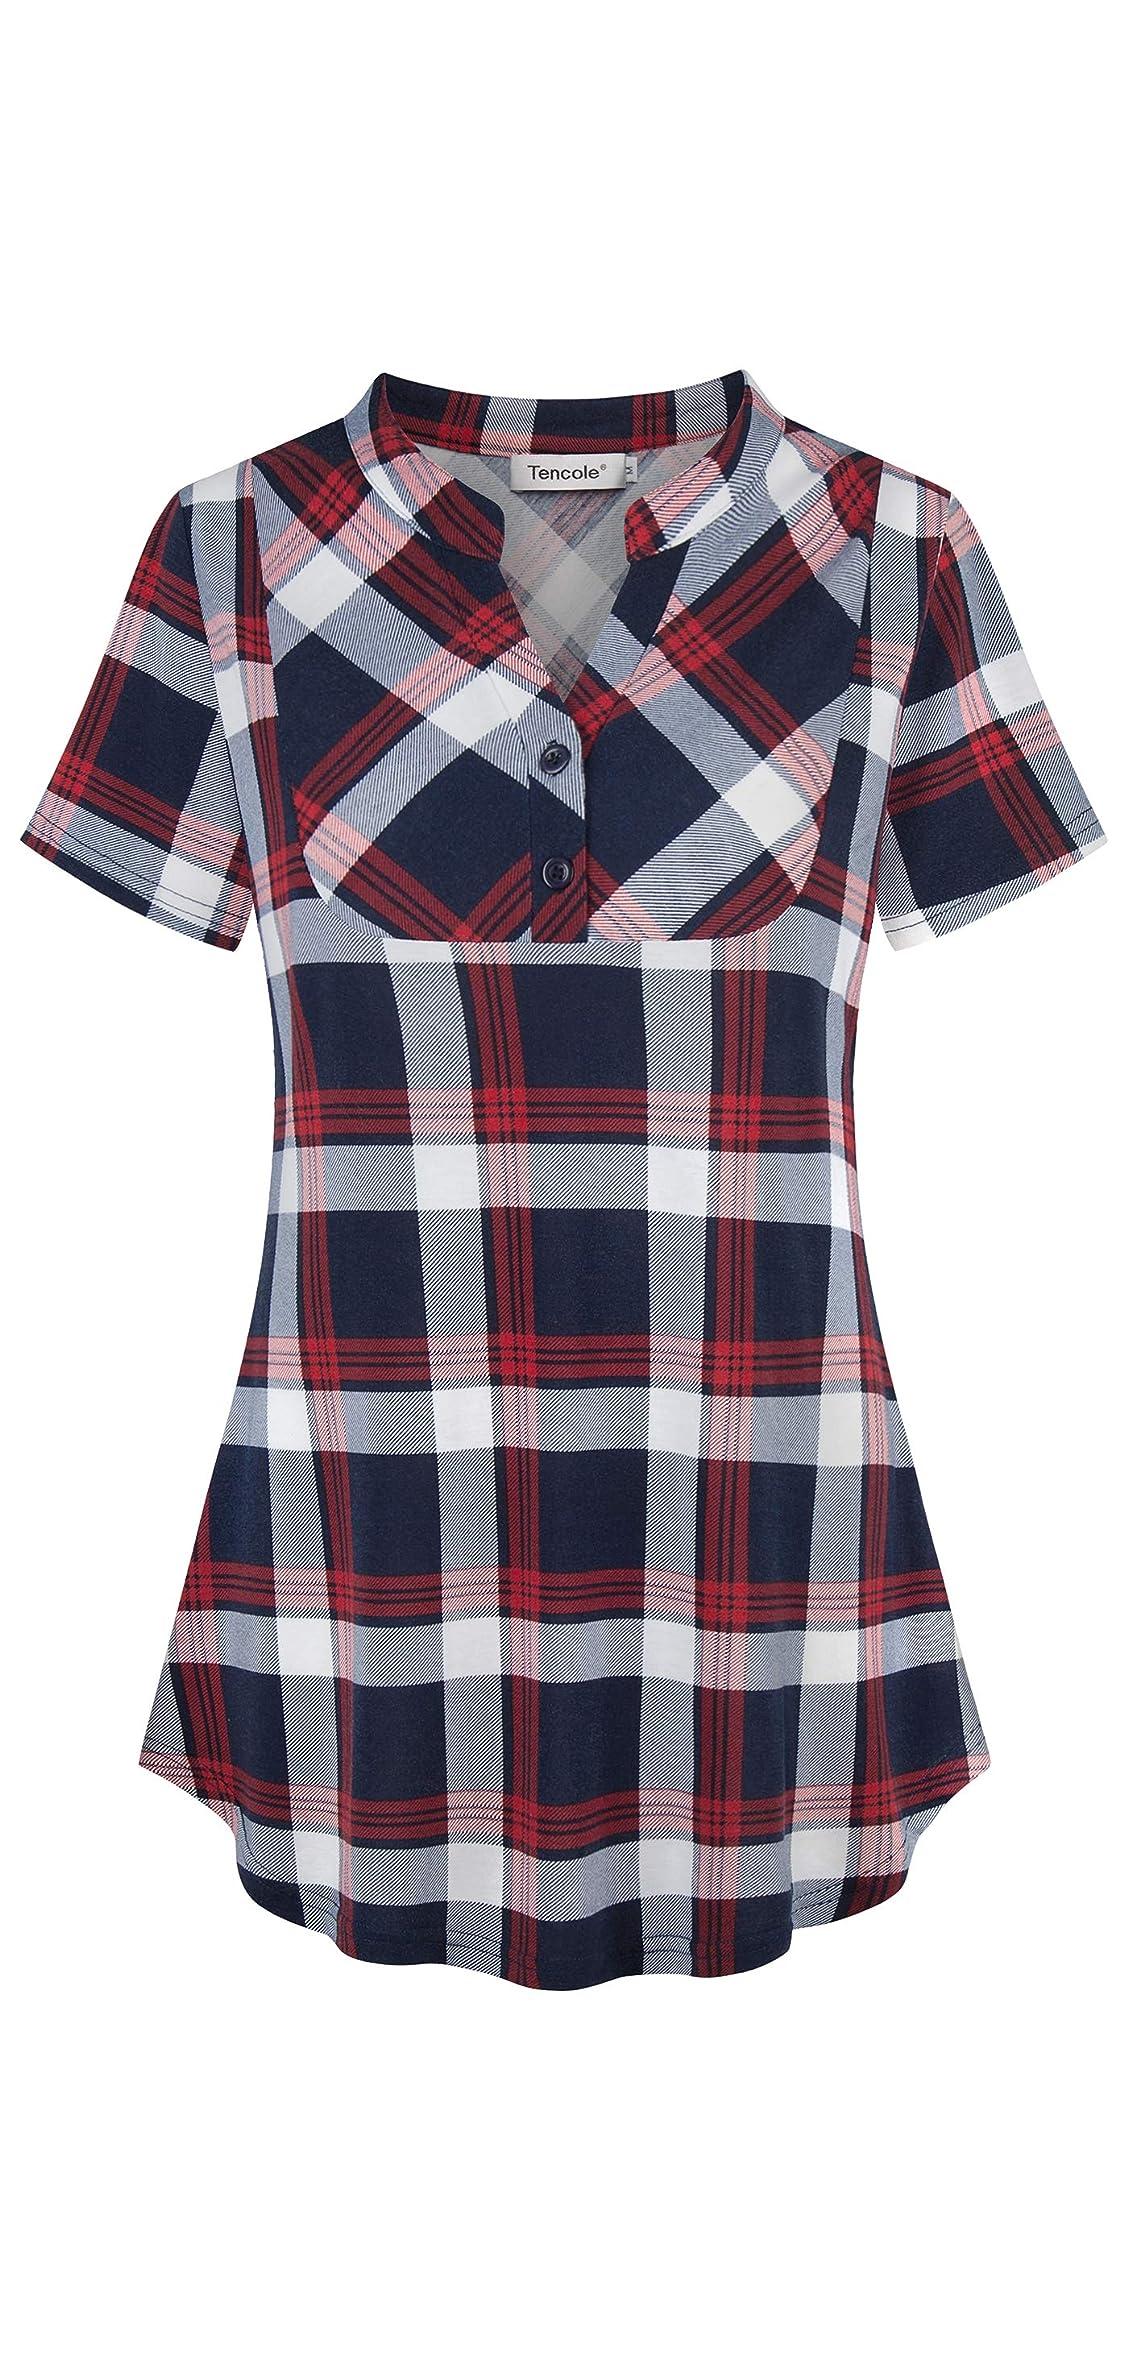 Womens Notch V Neck Plaid Tunic Shirts Short Sleeve Tops